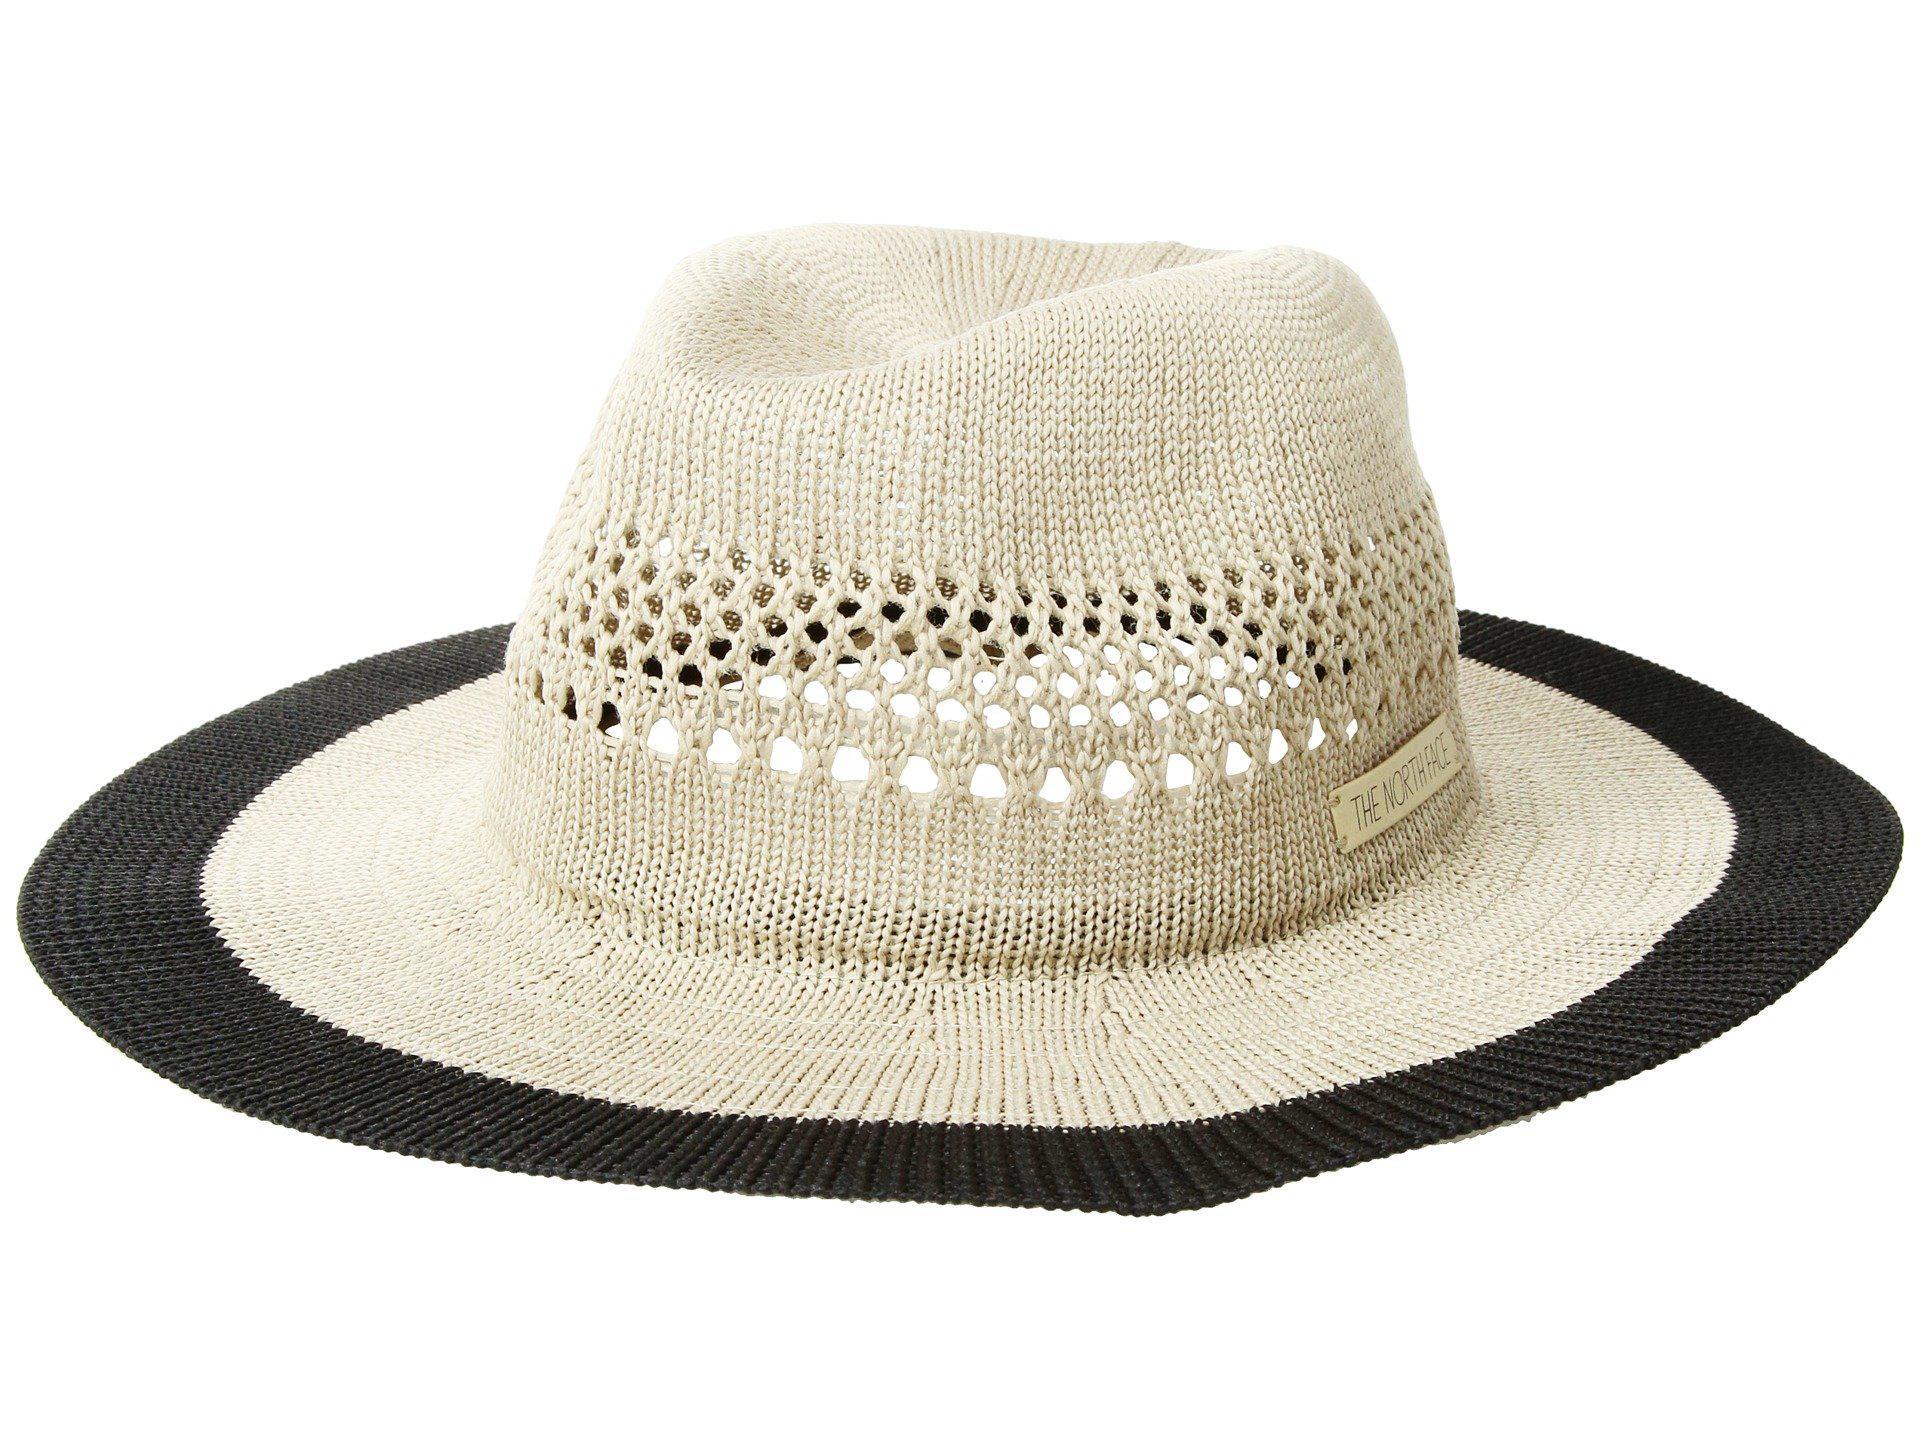 bdee6a433de Lyst - The North Face Packable Panama Hat (kelp Tan tnf Black ...